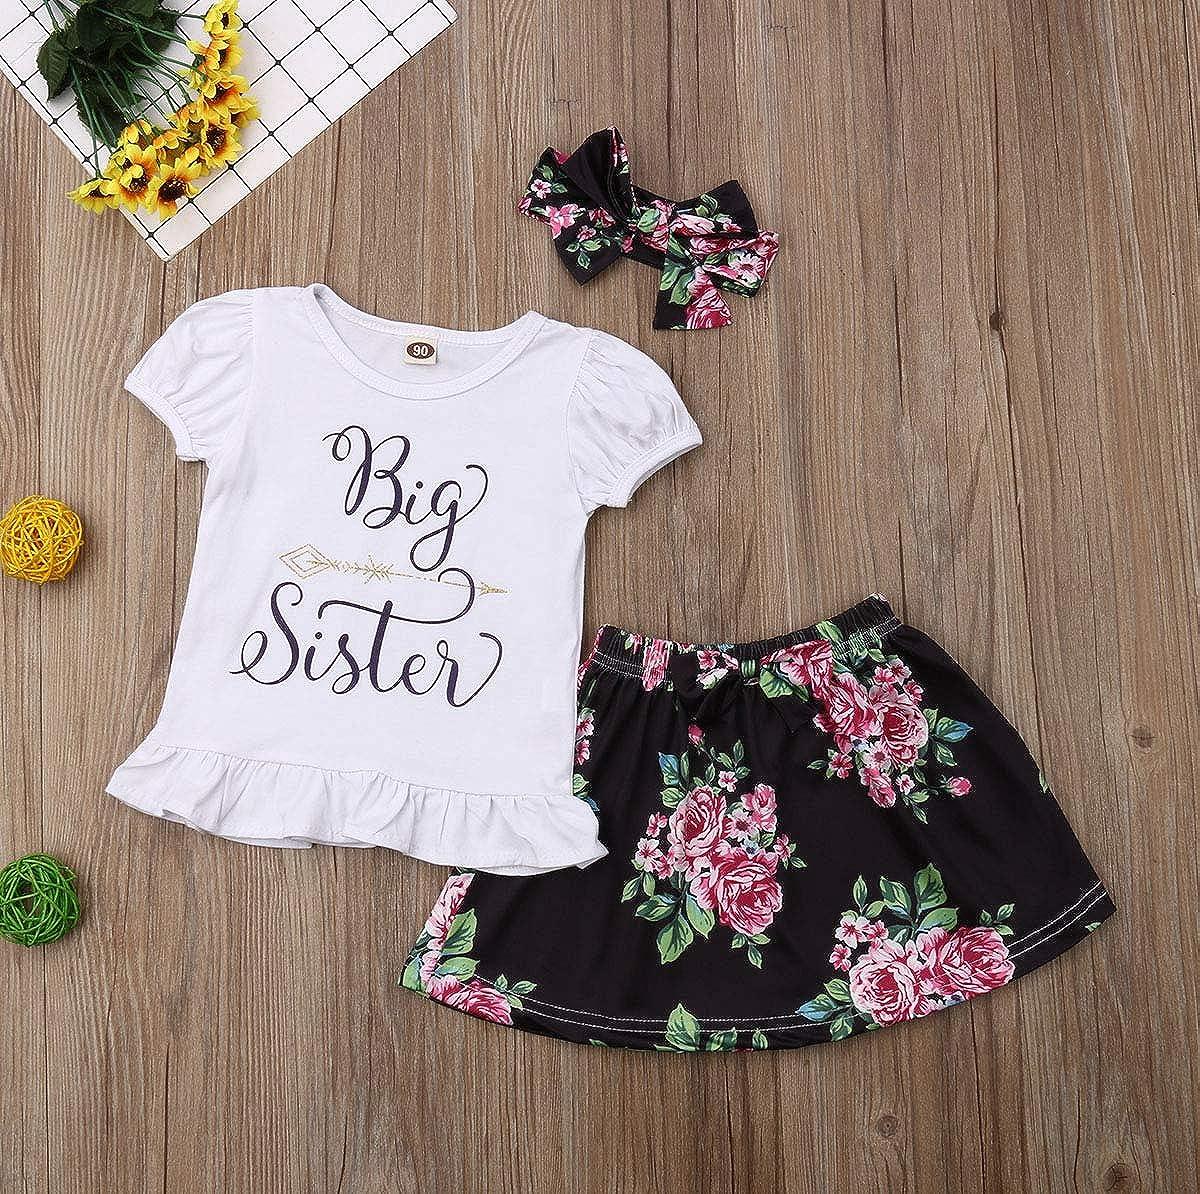 Newborn Baby Girls Little Sister Big Sister Short Sleeve Romper Floral Skirt Set Headband 3Pcs Outfit